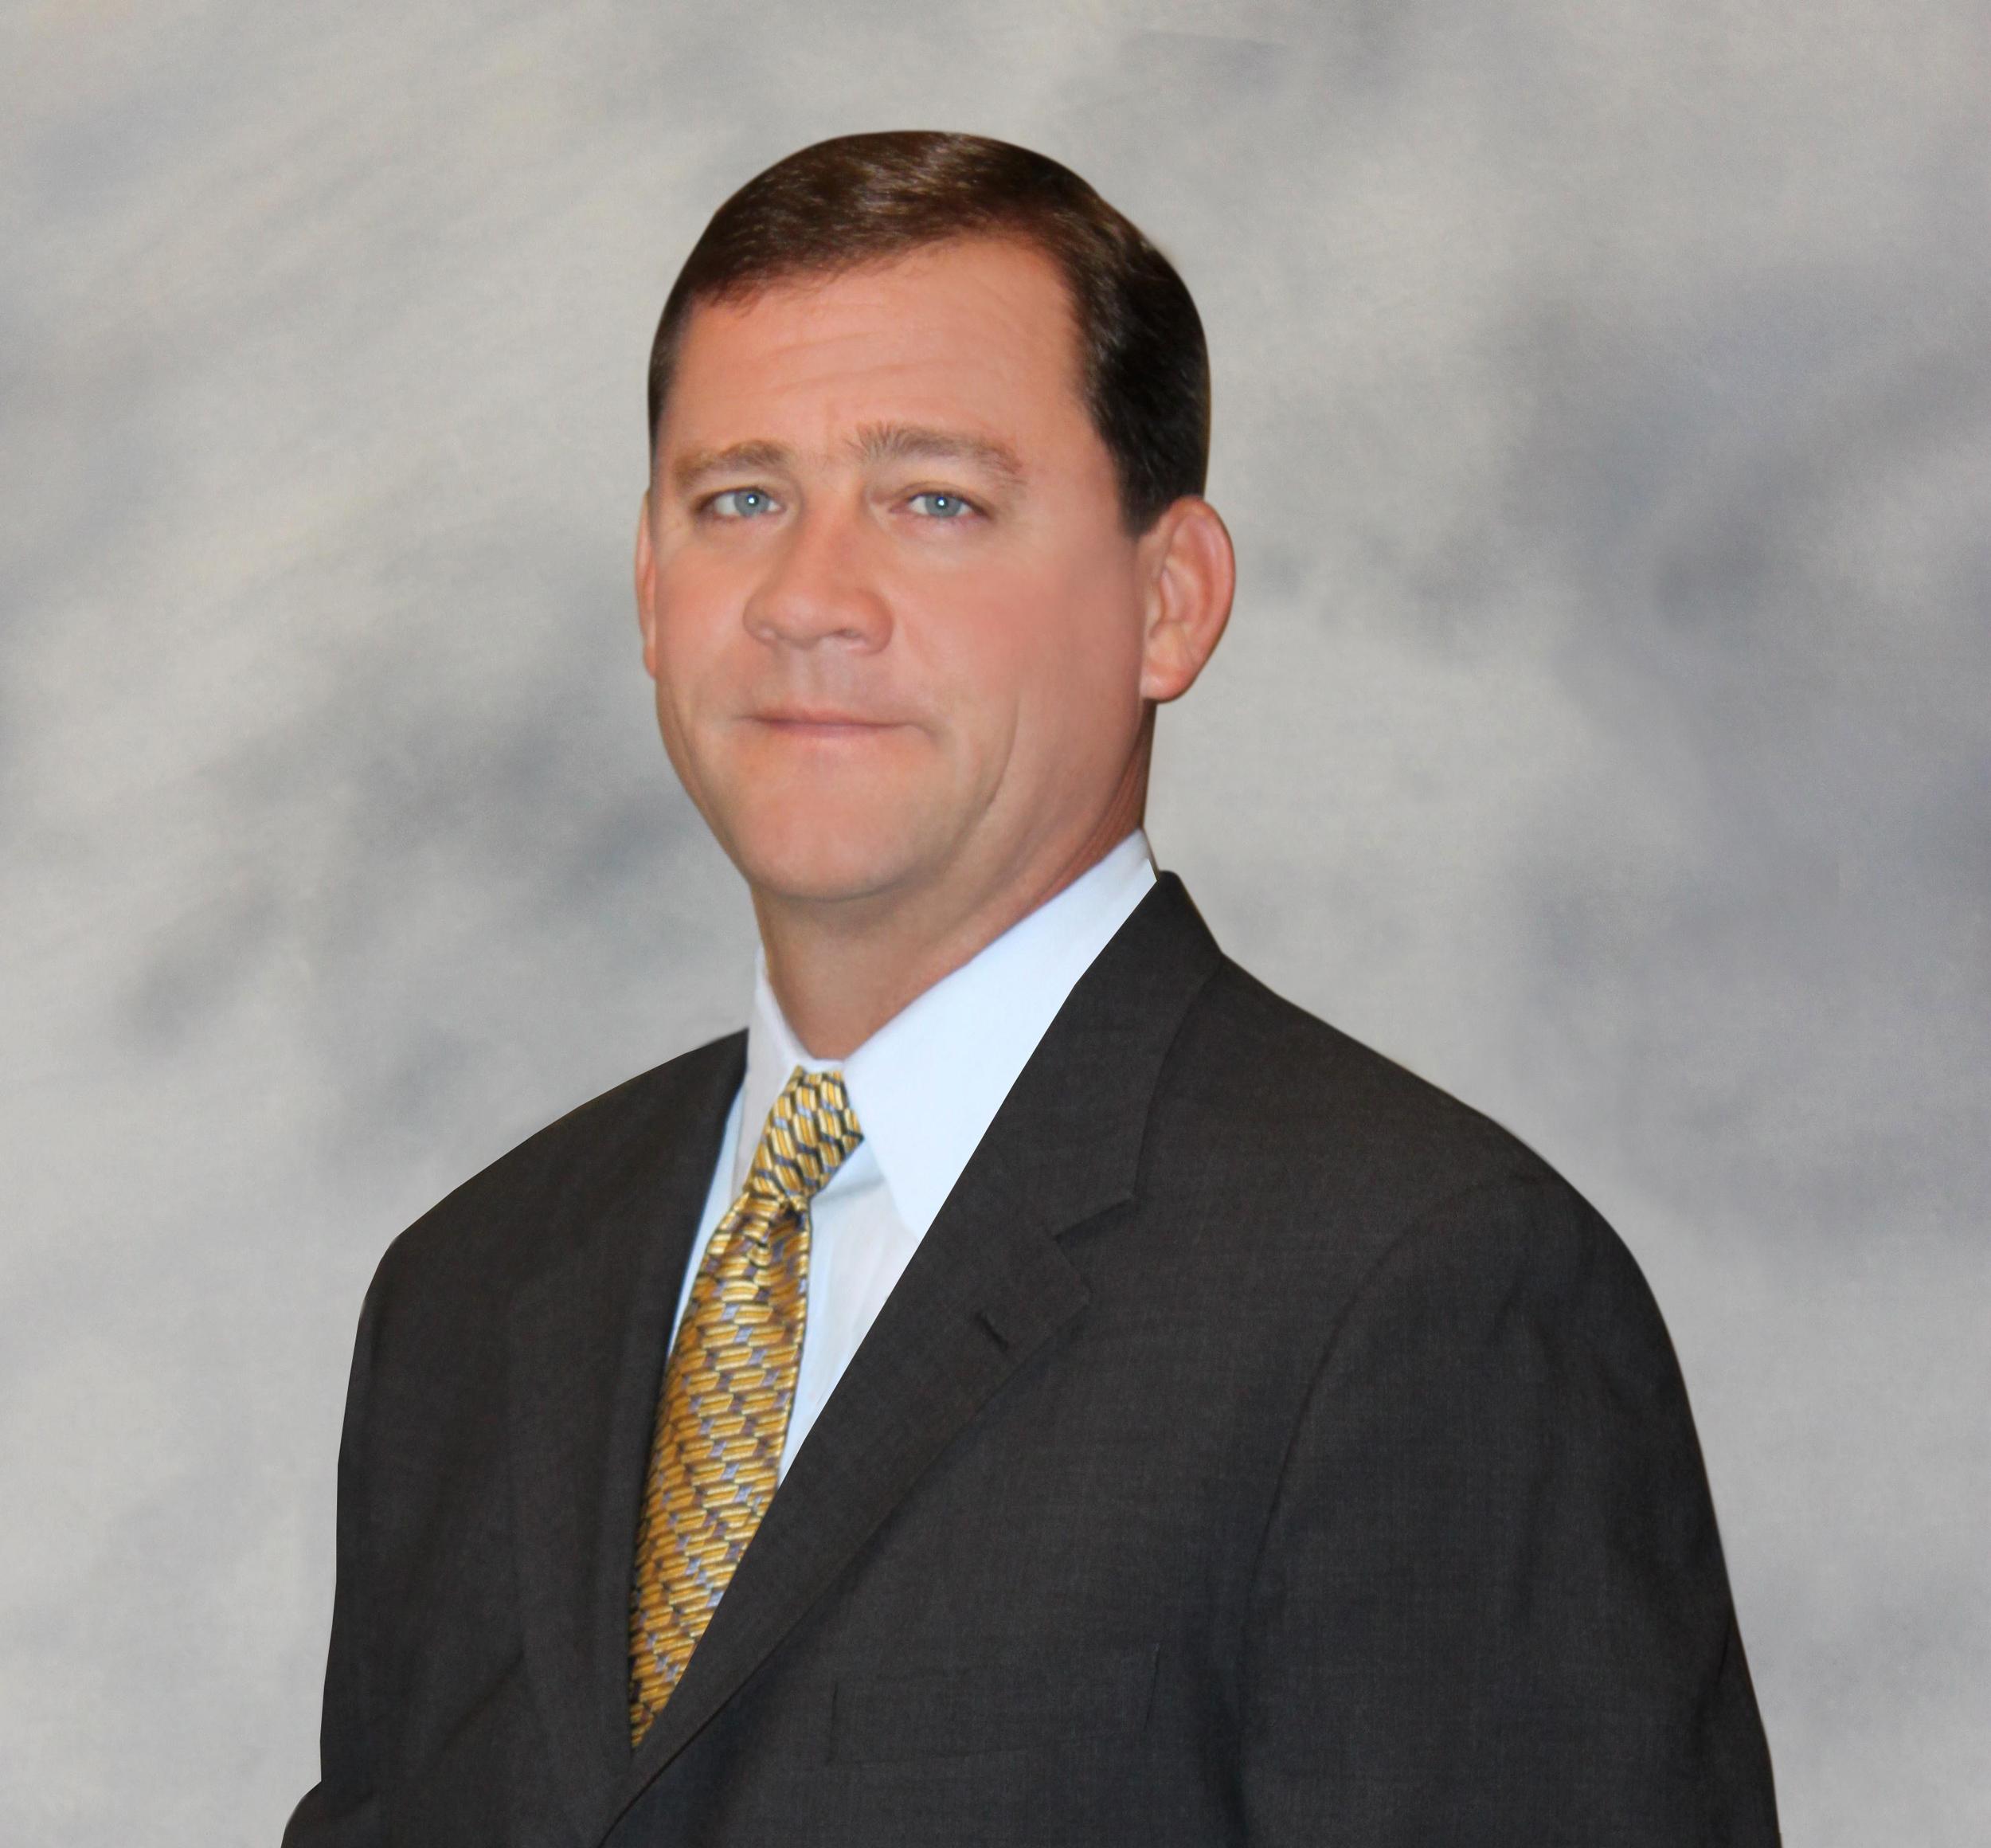 Tom Kazar, VP of Sales Transamerica Financial Solutions Group (Photo: Business Wire)